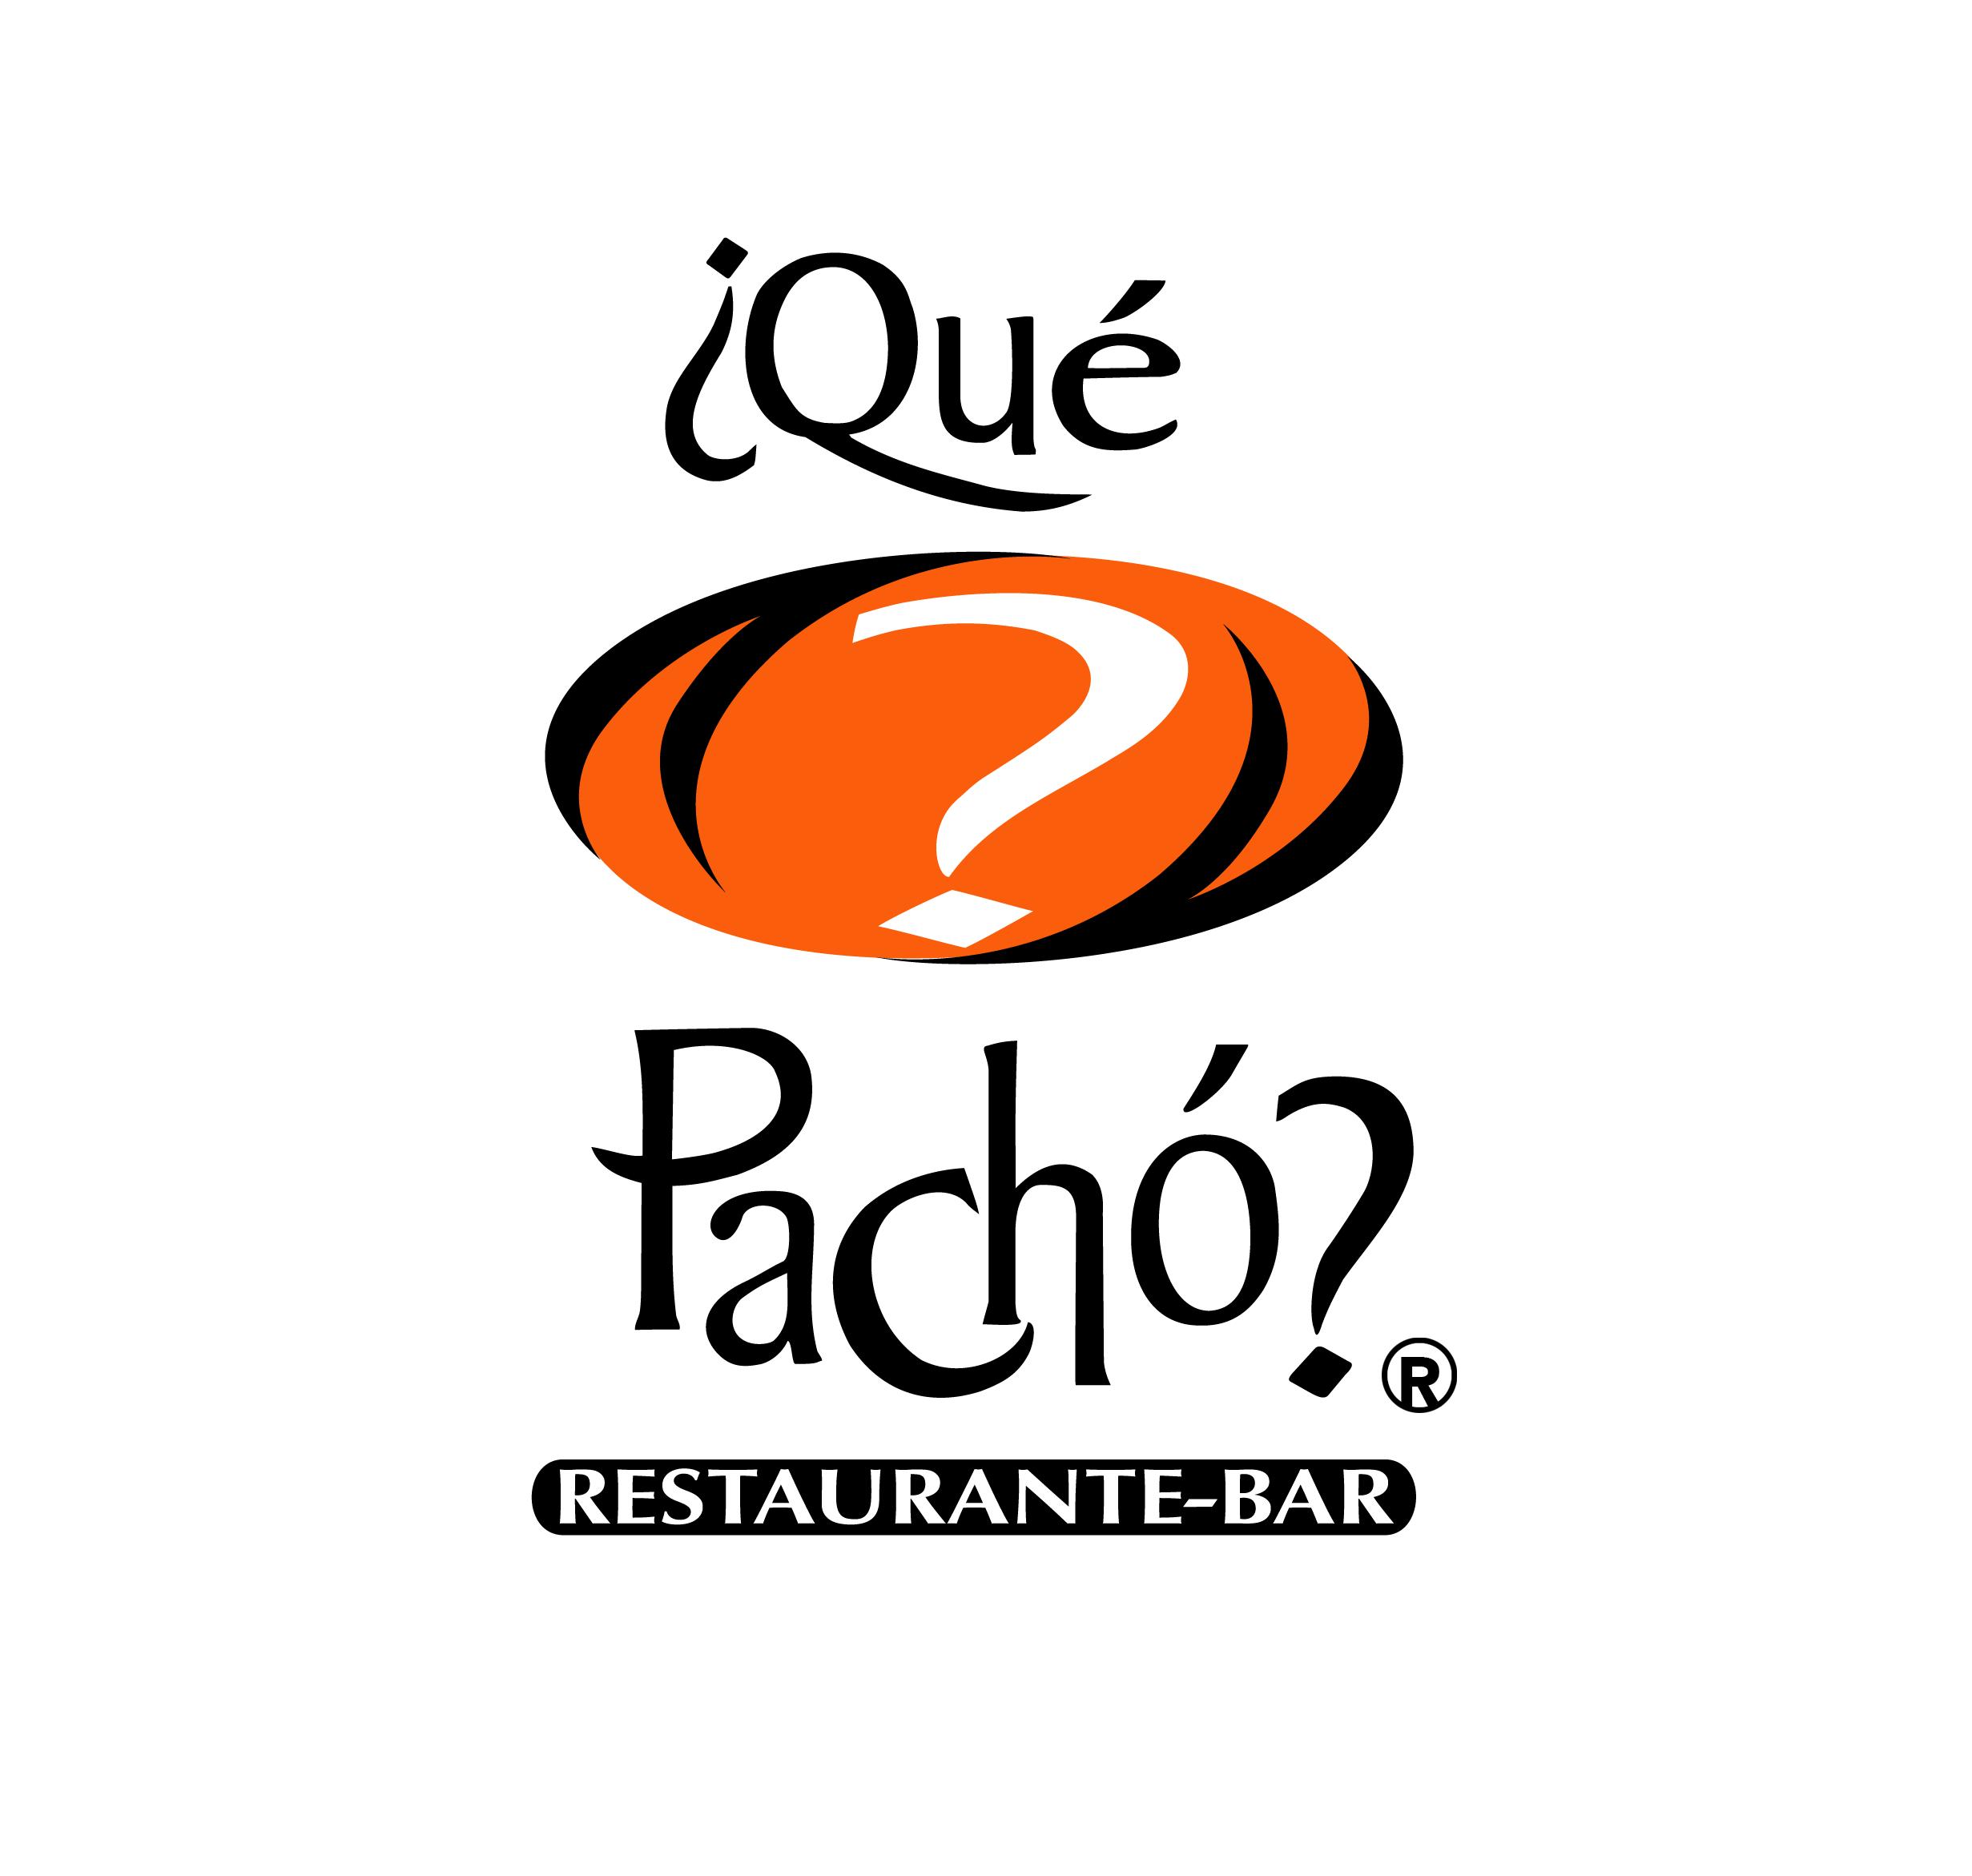 ¿Qué Pachó? Restaurante